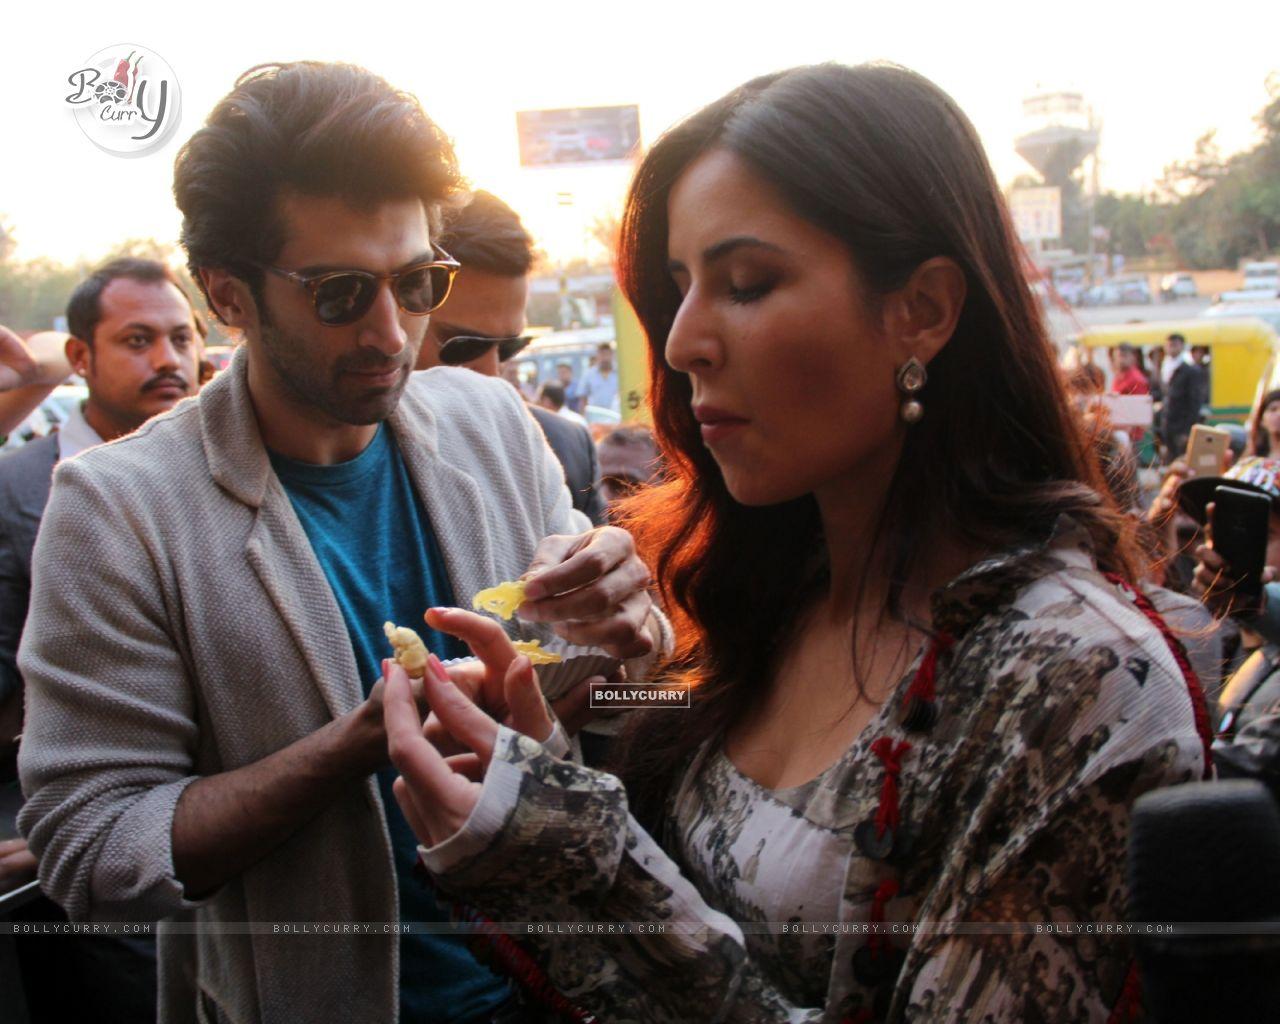 Aditya Roy Kapur and Katrina Kaif Bond over Jalebi in Janpath Market, Delhi (396321) size:1280x1024